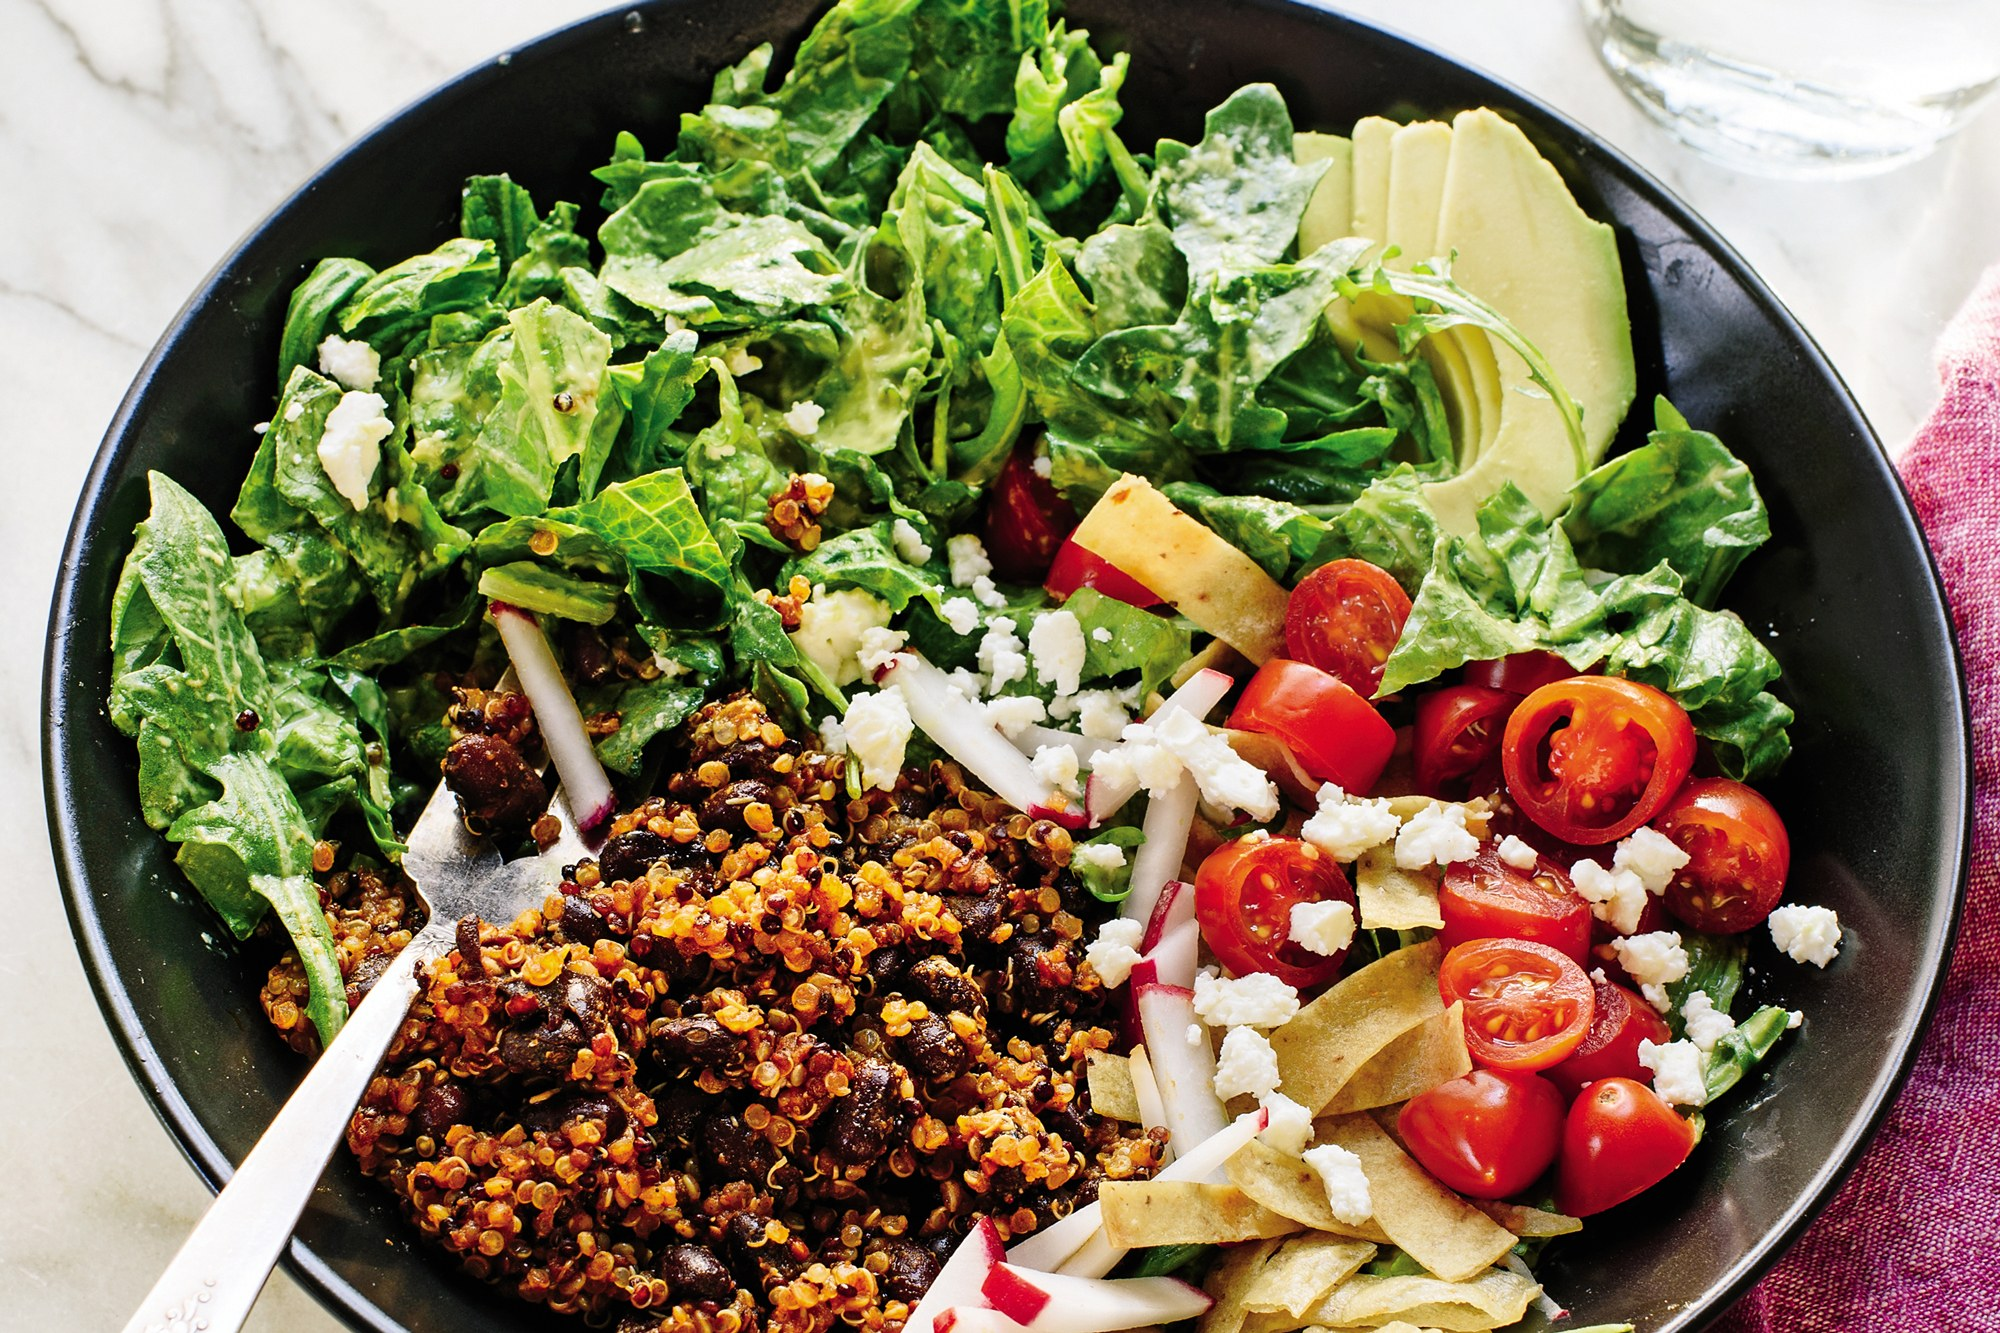 saladtime - Veggie Vitality: Preserving the freshness of our precious produce